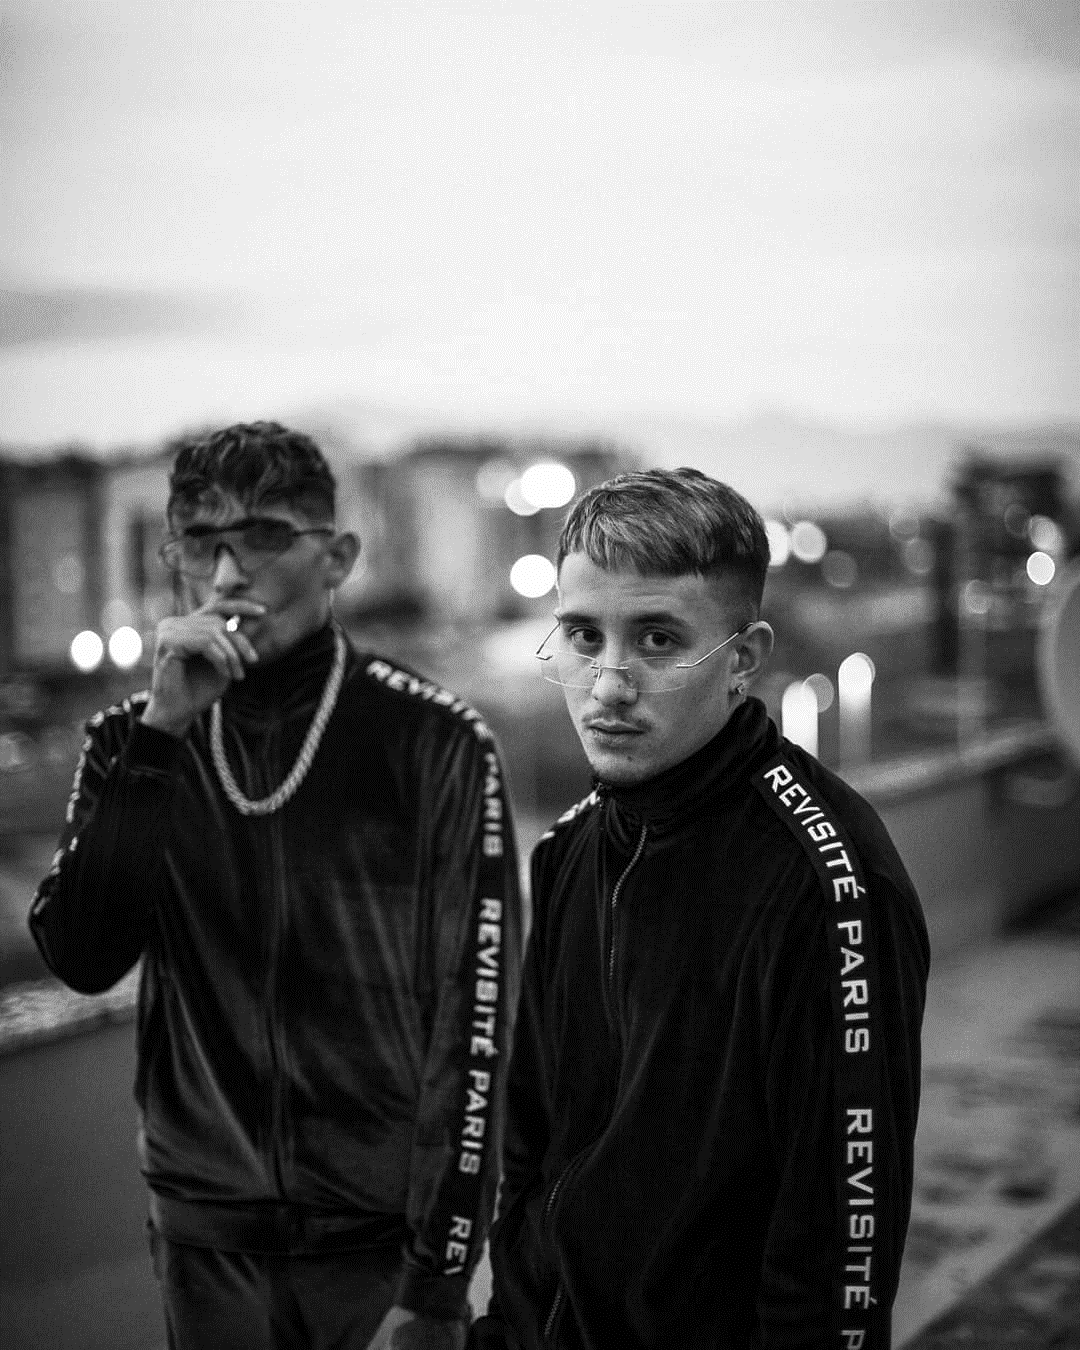 21HARI duo rap che spacca!